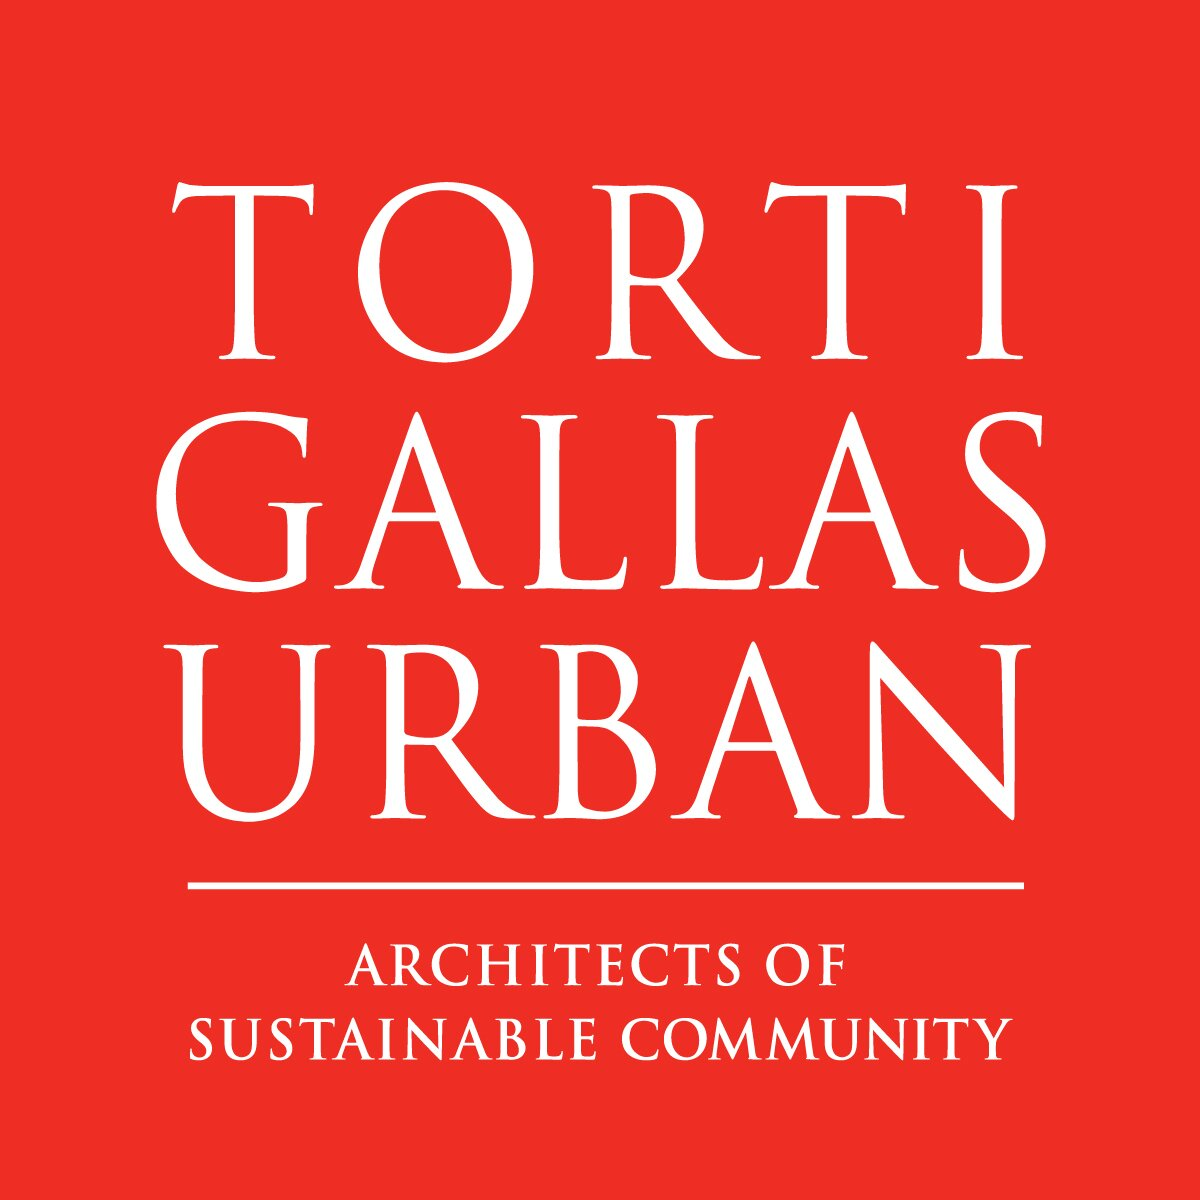 Torti Gallas Urban On Twitter Congratulations Lawrence V Murphy